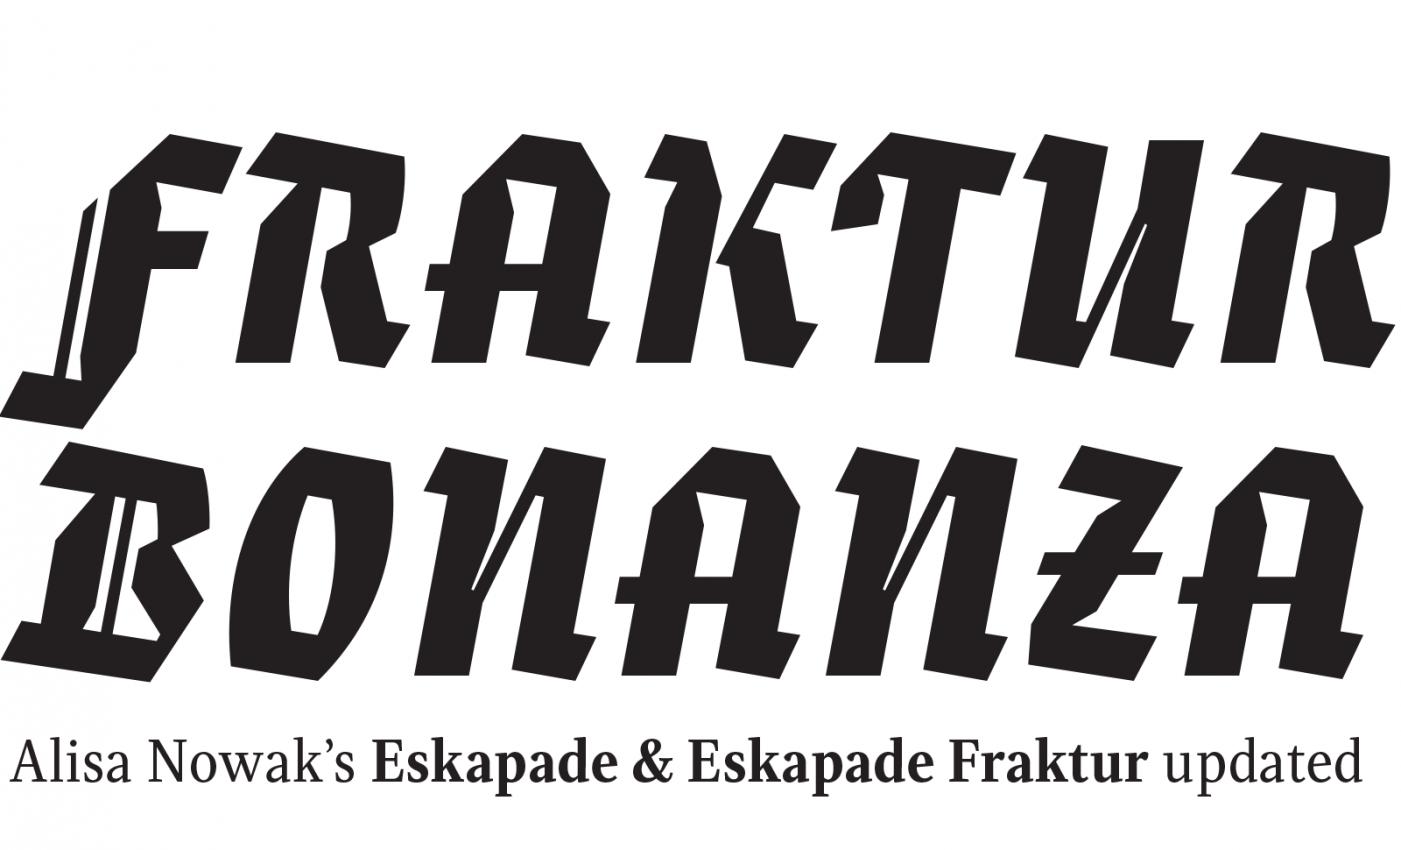 eskapade-updated-v2.thumb.png.c293f227410c5f930767047ff736602e.png